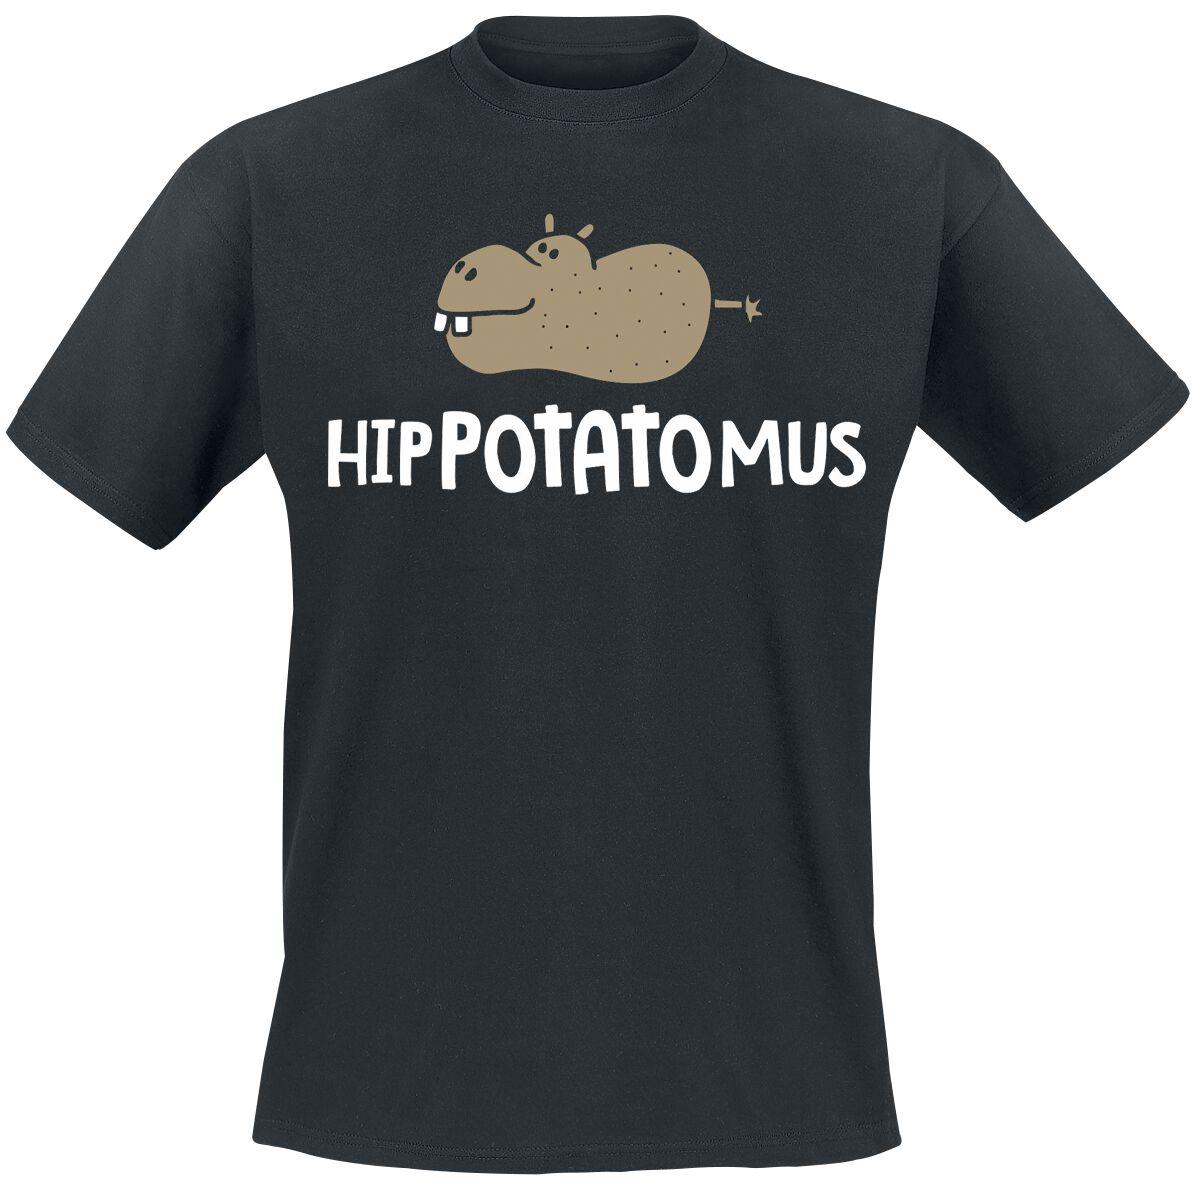 Hippotatomus T-Shirt schwarz POD - BY083 - POD